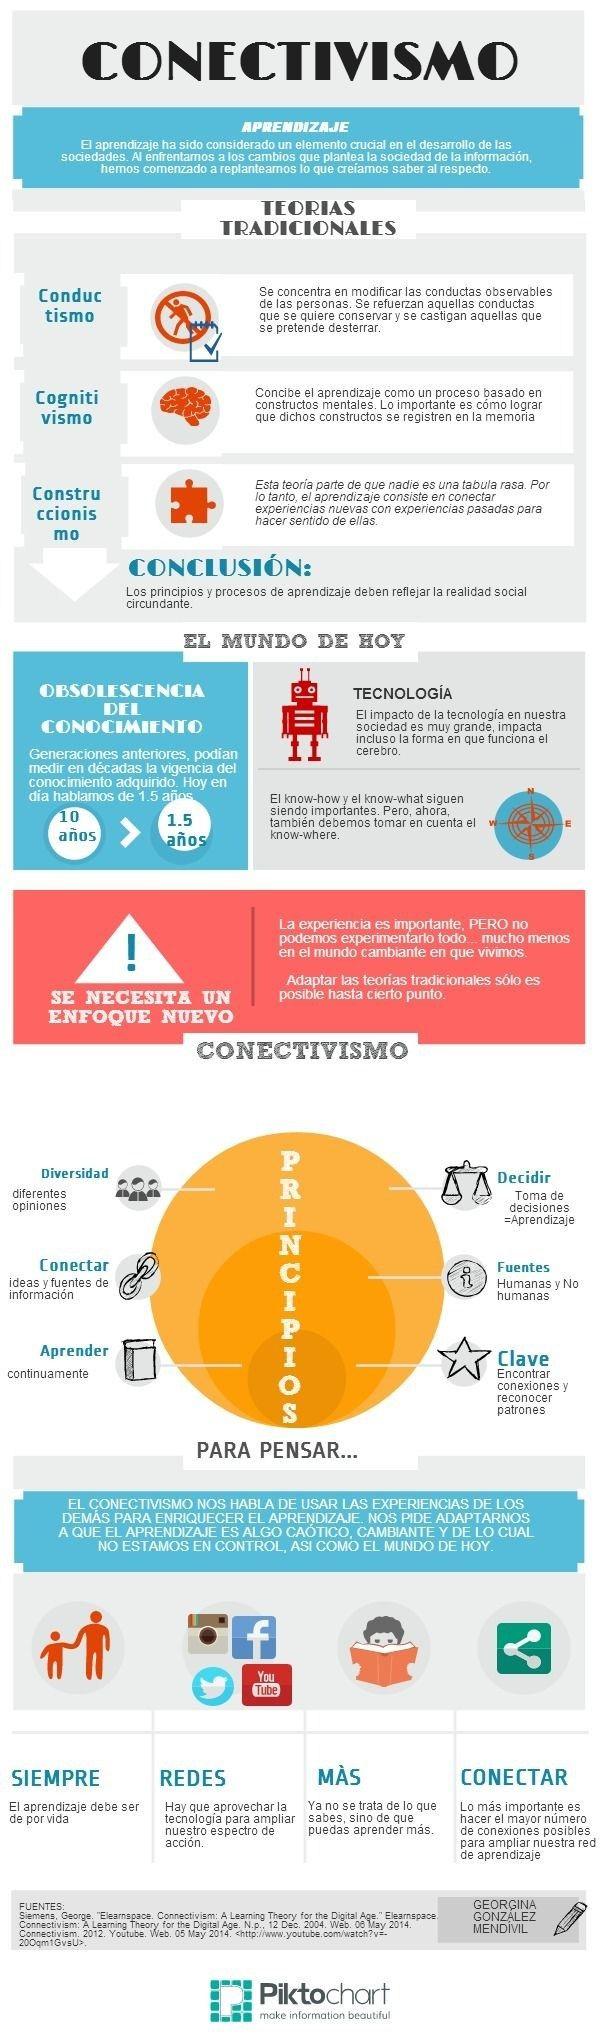 ConectivismoUnModeloAprendizajeSociedadInfomación-Infografía-BlogGesvin